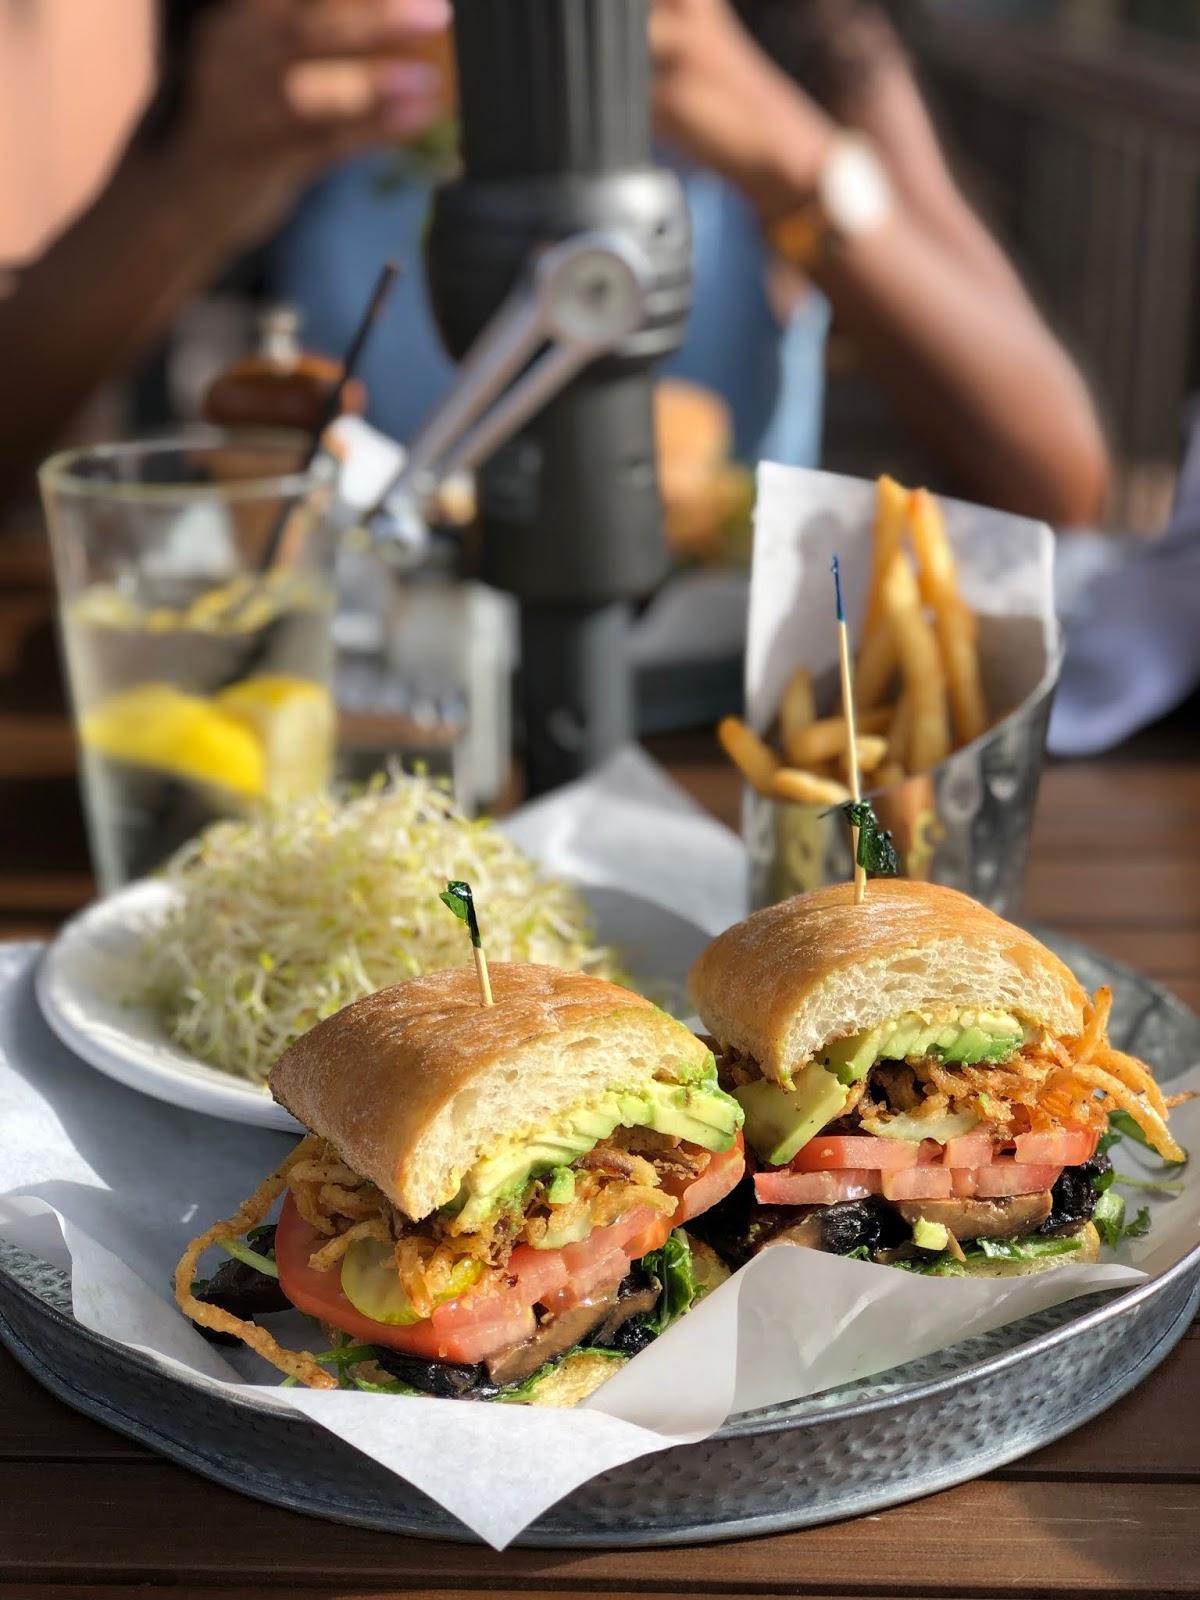 Best Places to eat in Arizona, Sedona, The Hudson, Portobello Mushroom Sandwich